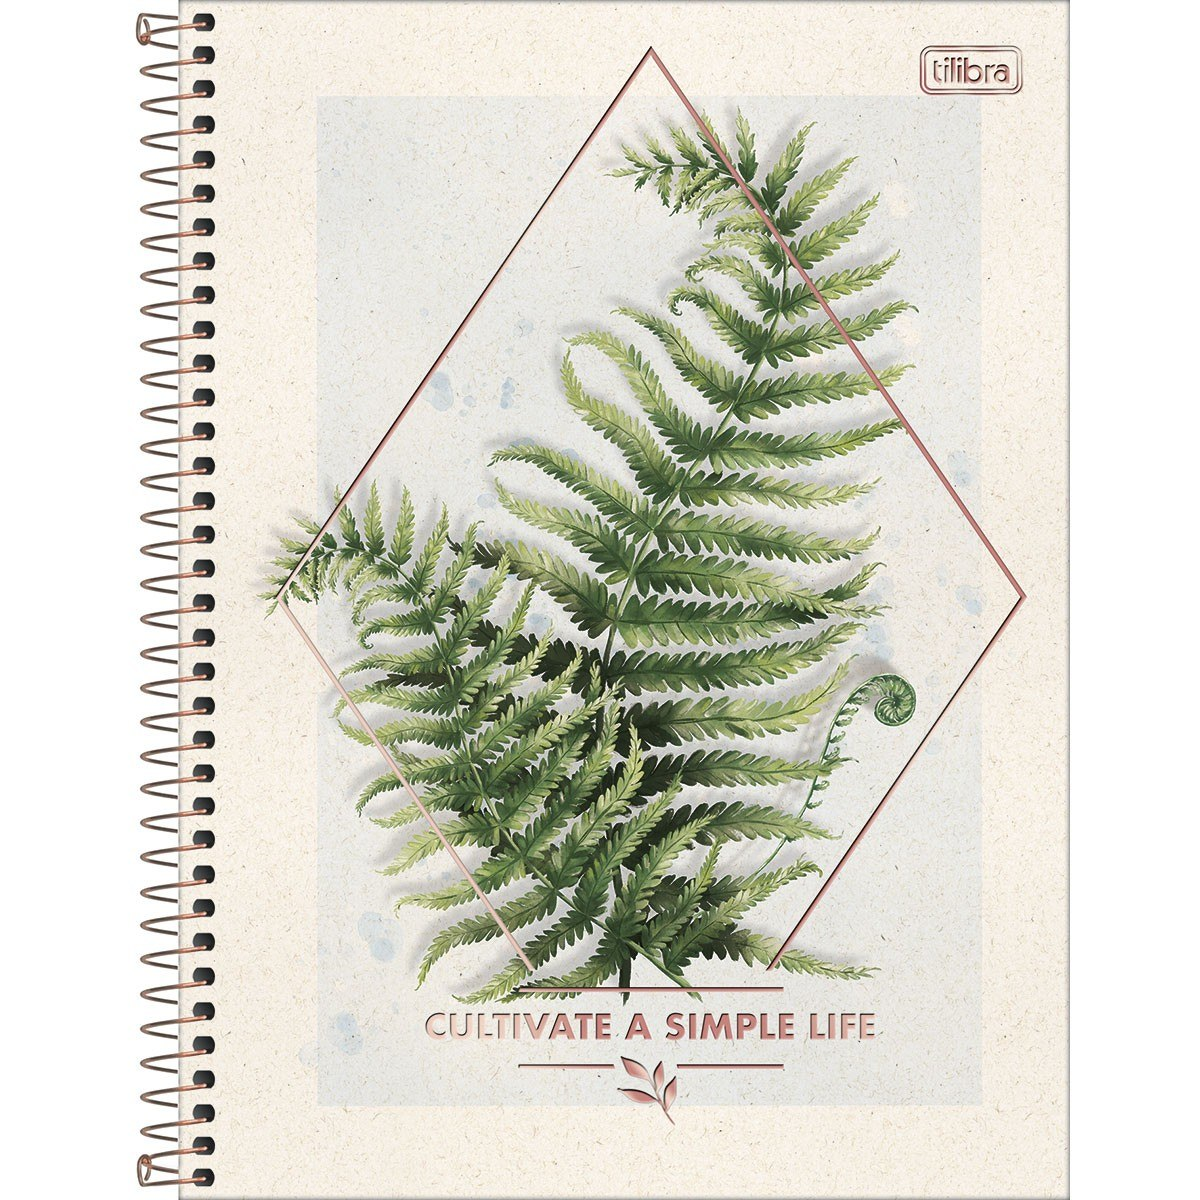 Caderno Espiral Capa Dura Universitário 1 Matéria Naturalis 80 Fls - Tilibra